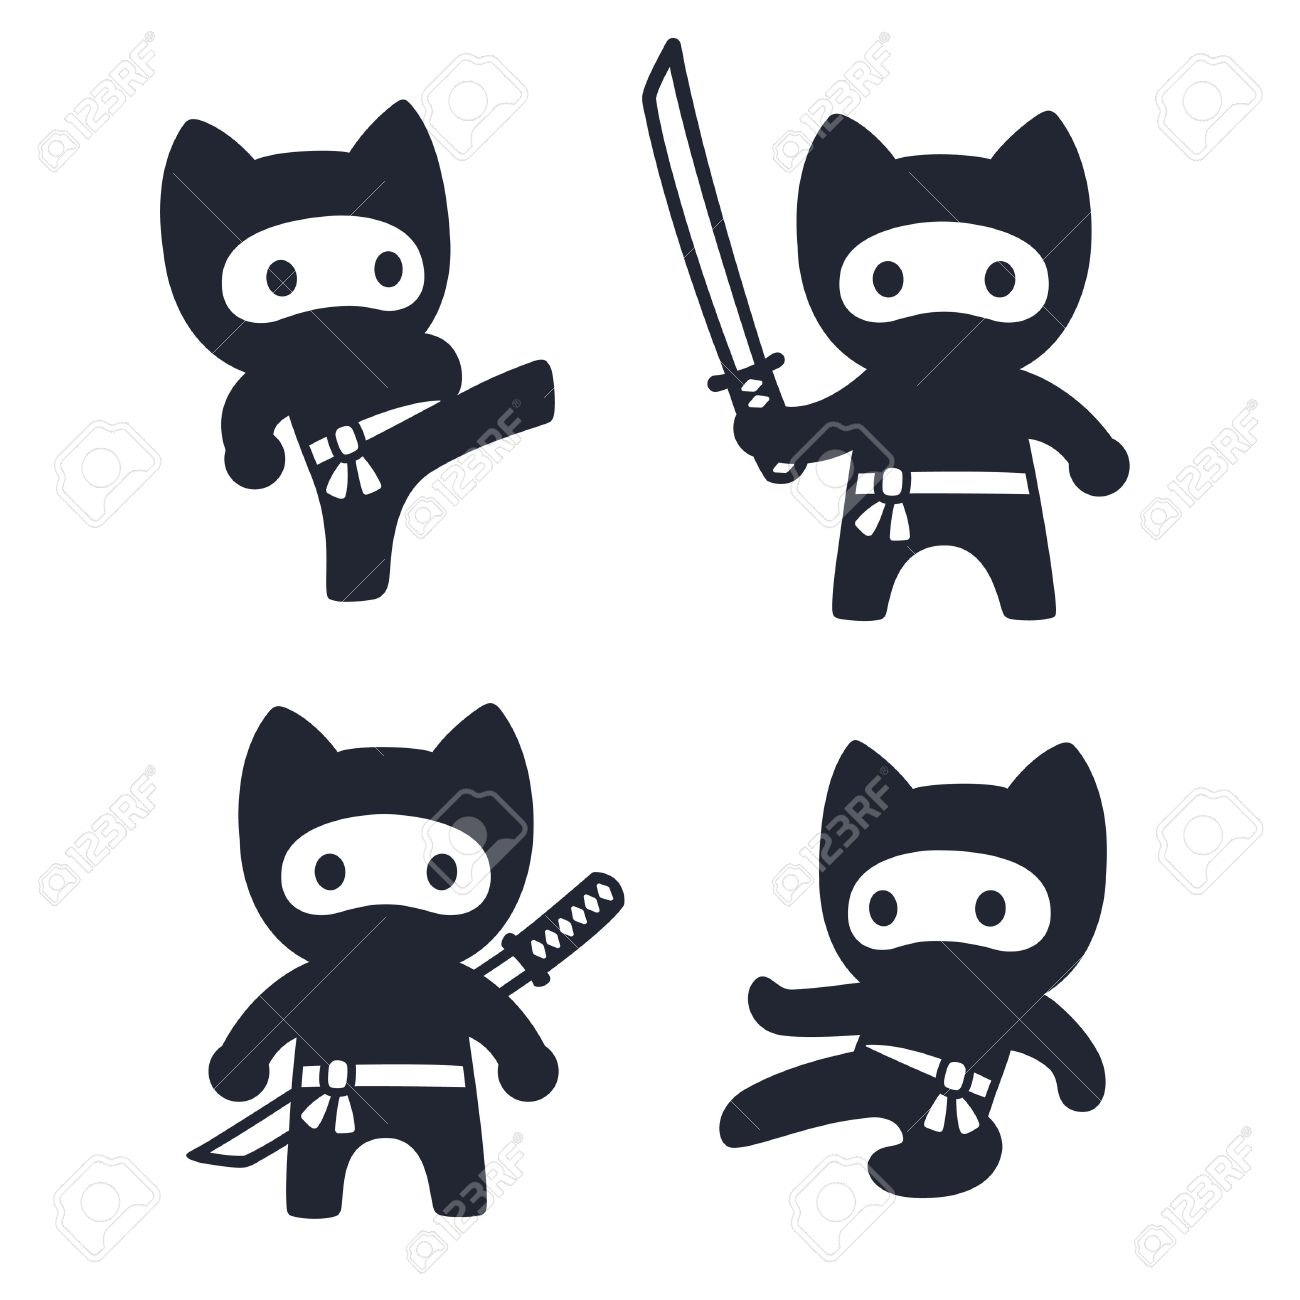 Cute cartoon ninja cat set adorable vector black and white drawings in simple modern japanese